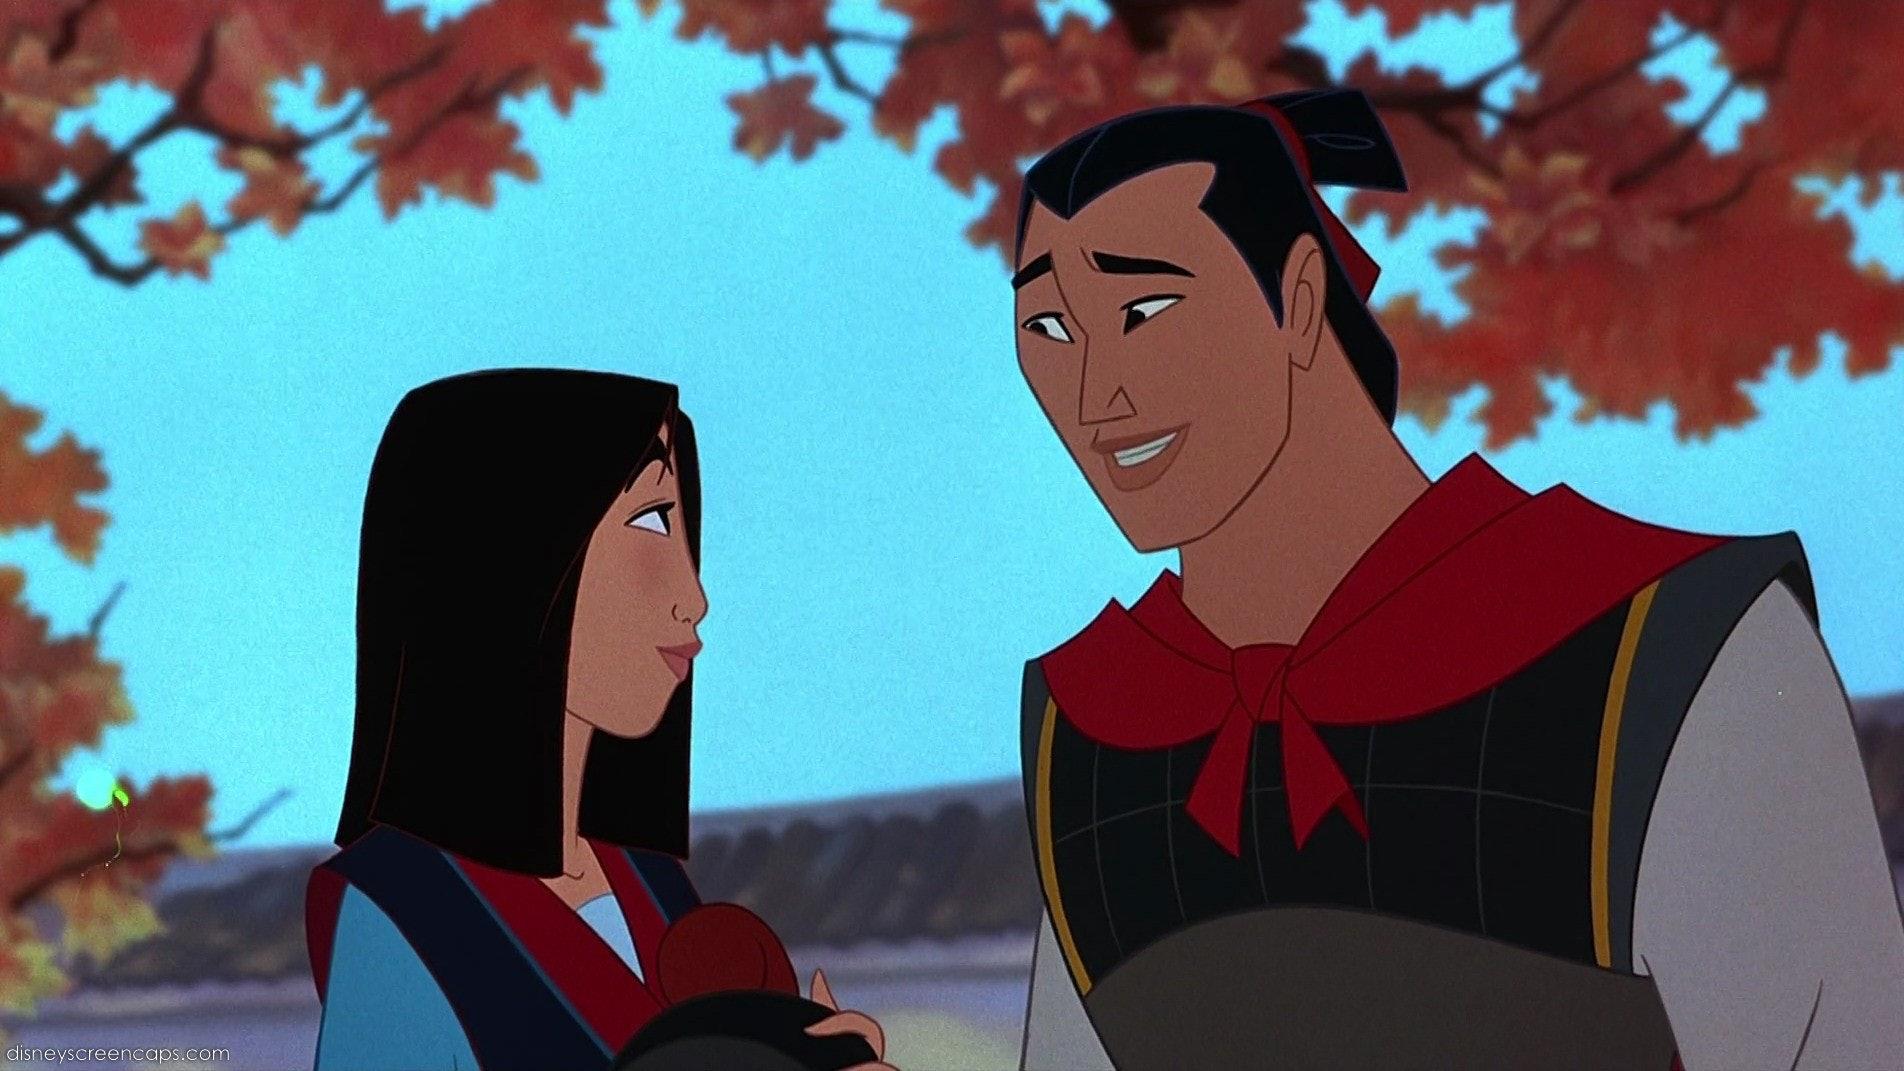 Live-Action 'Mulan' Should Avoid White-Washing — Disney Needs To ...